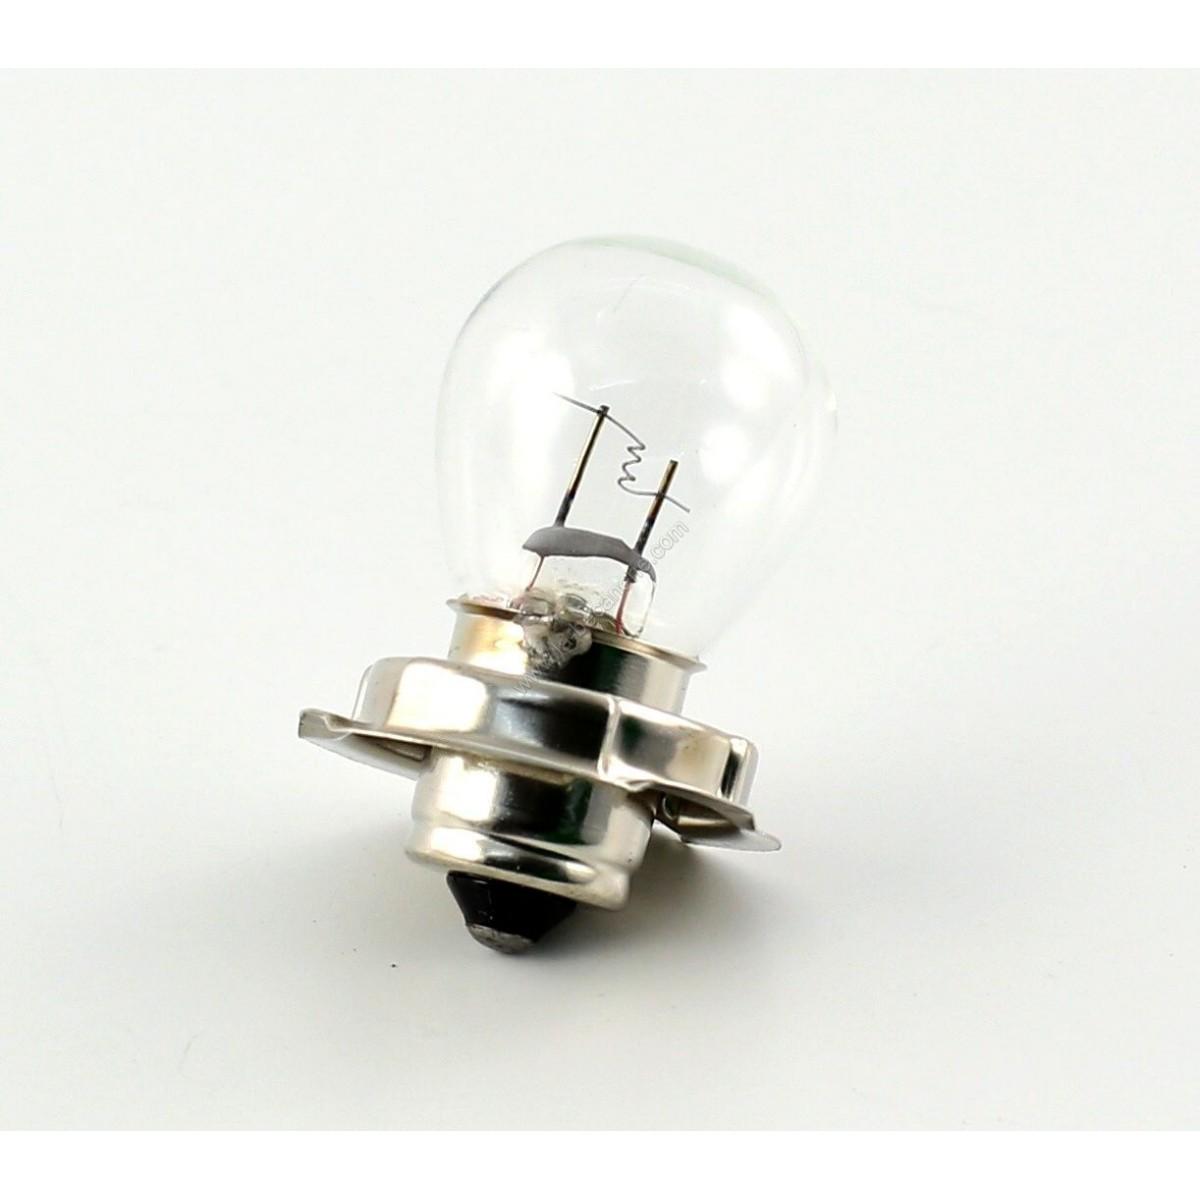 ampoule s3 12v 15w p26s moto. Black Bedroom Furniture Sets. Home Design Ideas